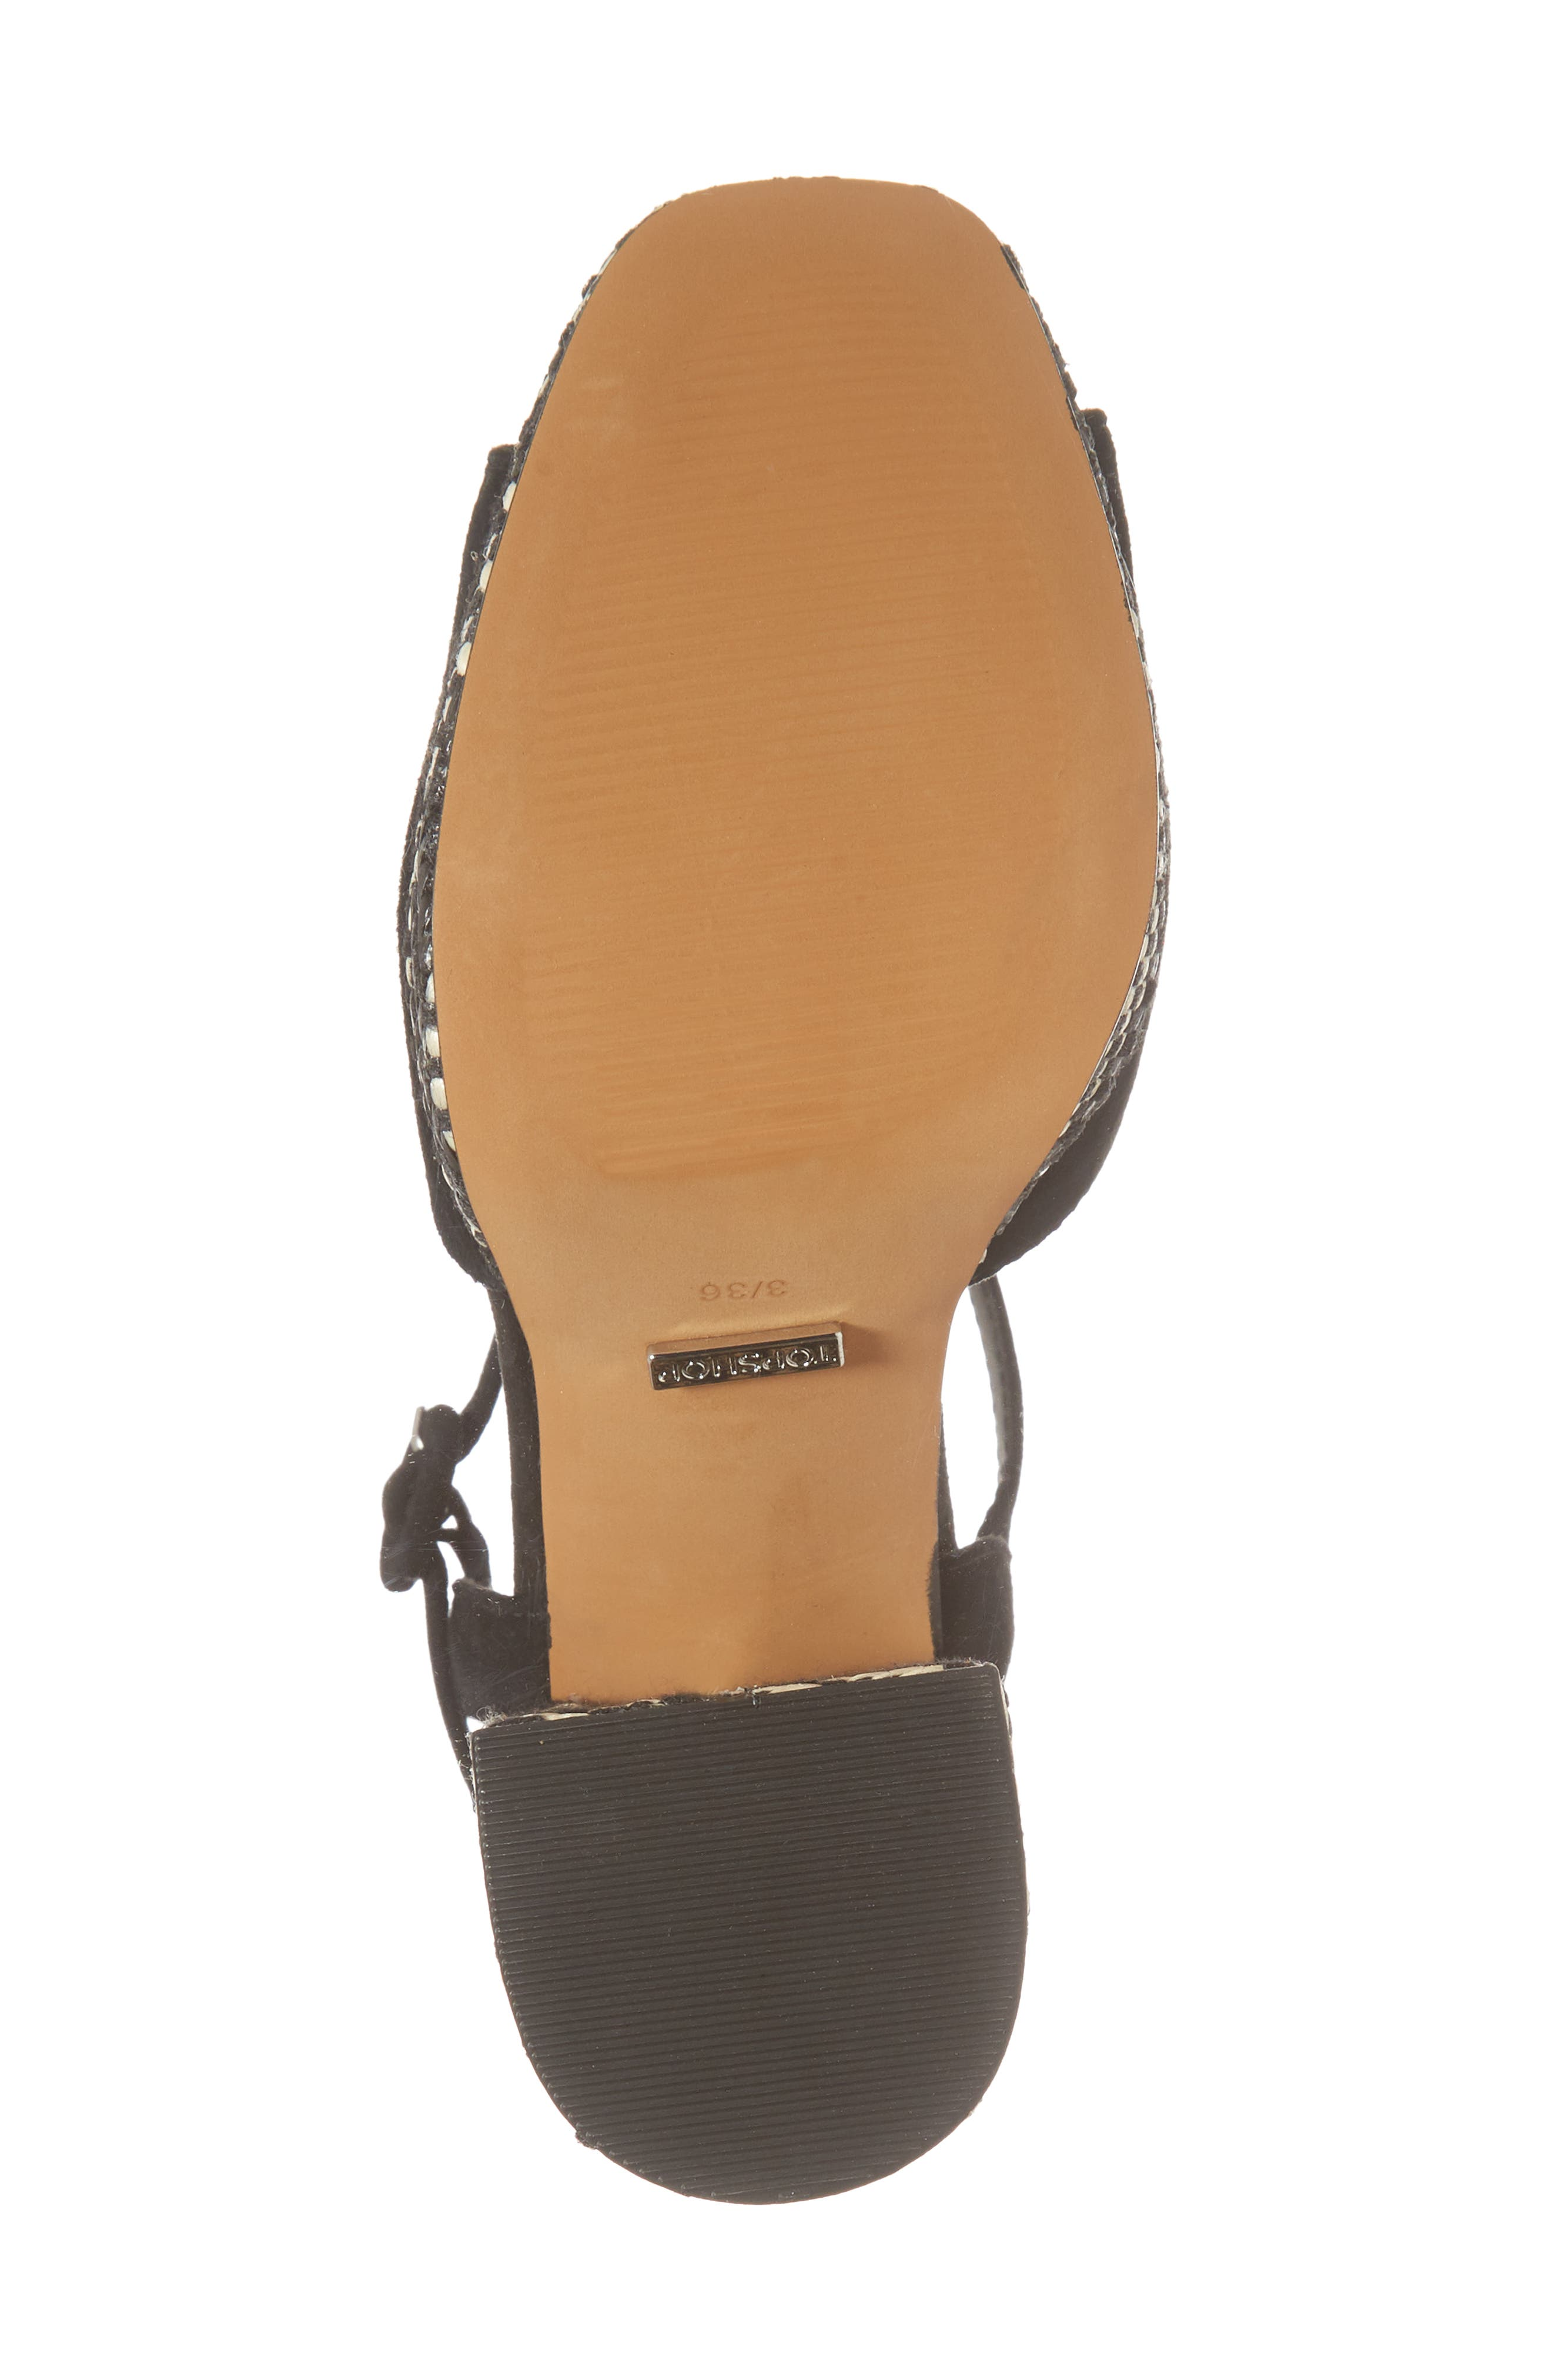 Laura Woven Block Heel Sandal,                             Alternate thumbnail 6, color,                             Black Multi